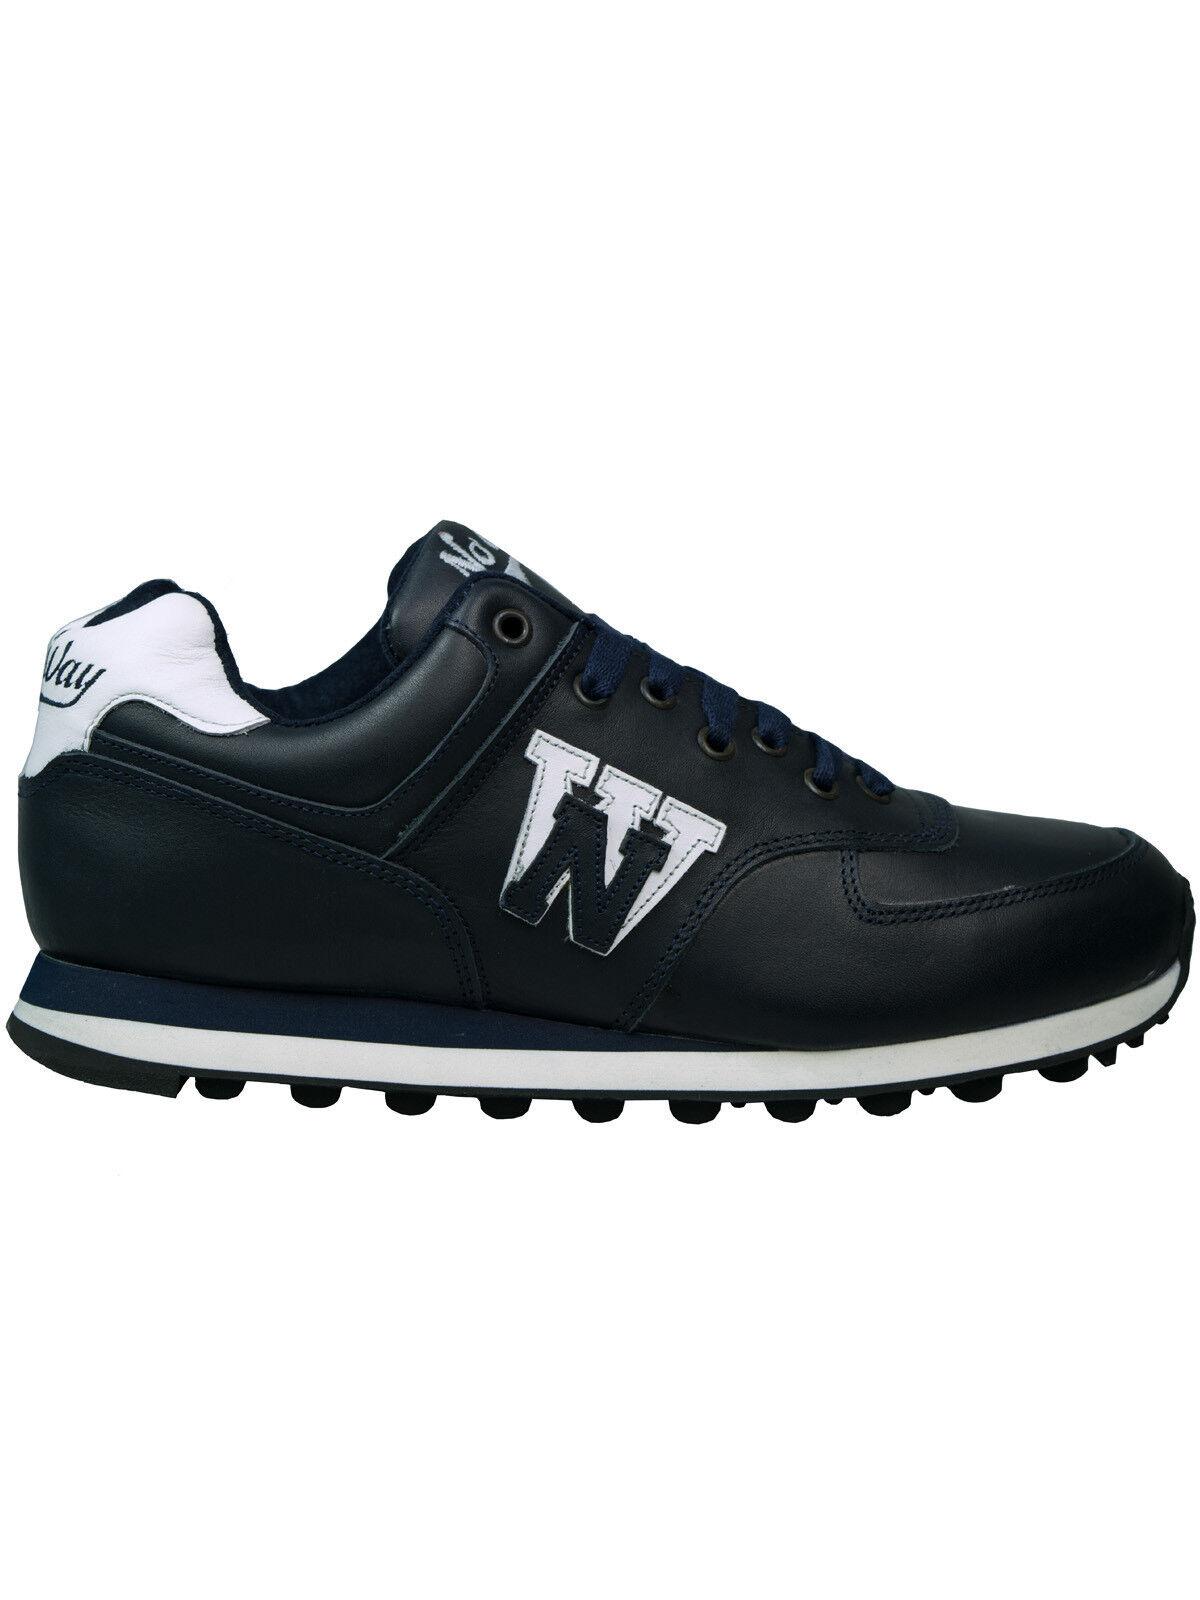 No Way Turnschuh / Sneaker / Schuh 3662 Glattleder Navy / Dunkelblau #5004